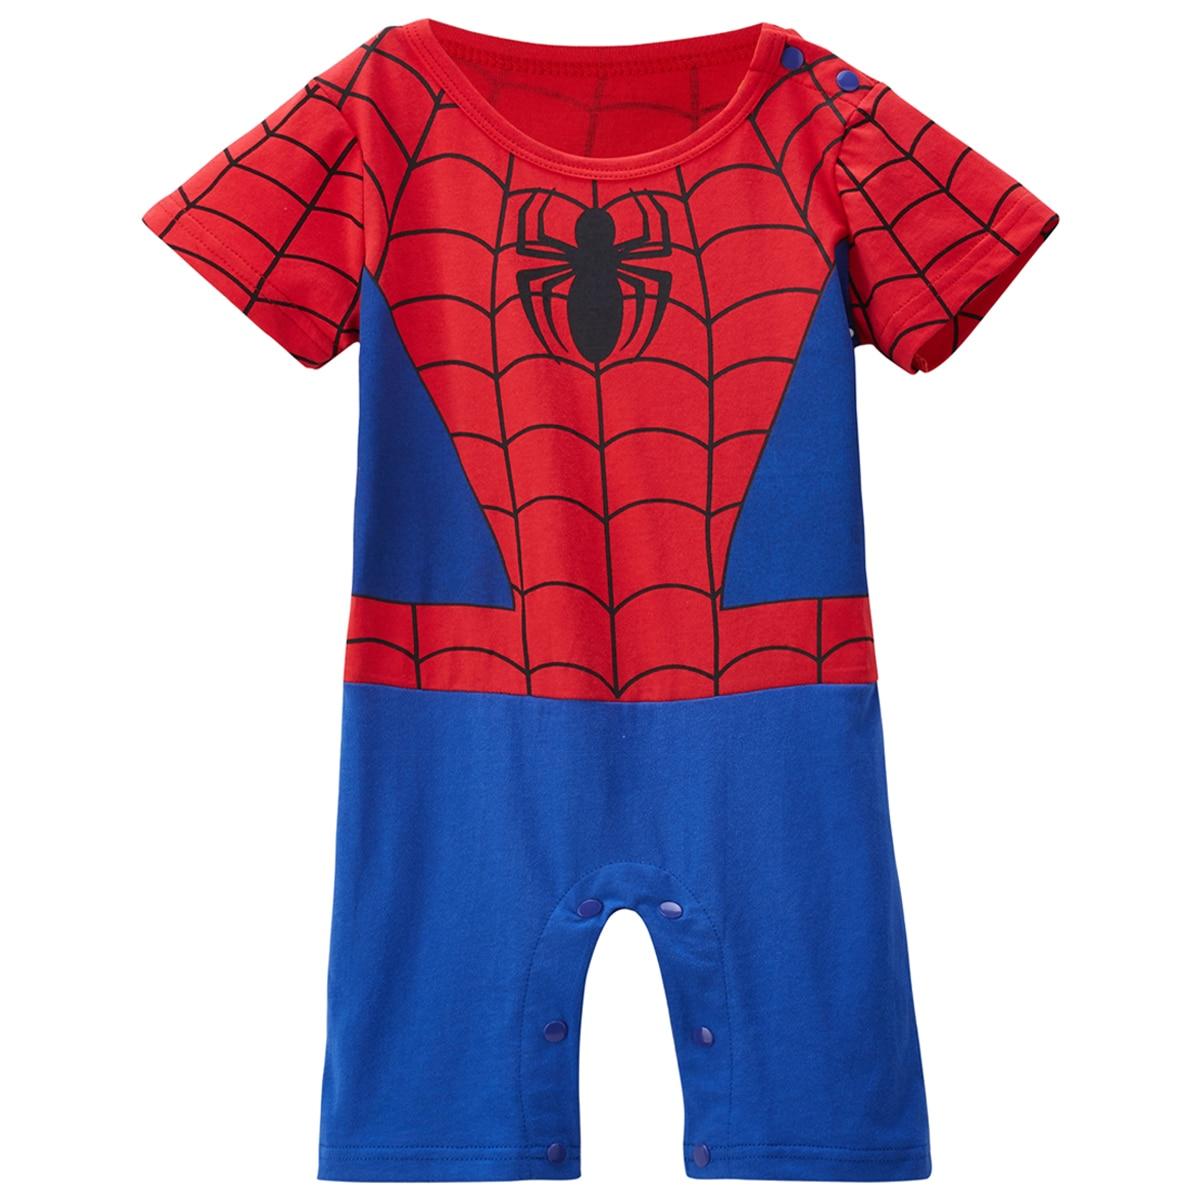 Baby Jungen Mädchen Spiderman Kostüm Neugeborenen Avengers Strampler Kleinkind Party Overall Superhero Cosplay Overall Infant junge kleidung